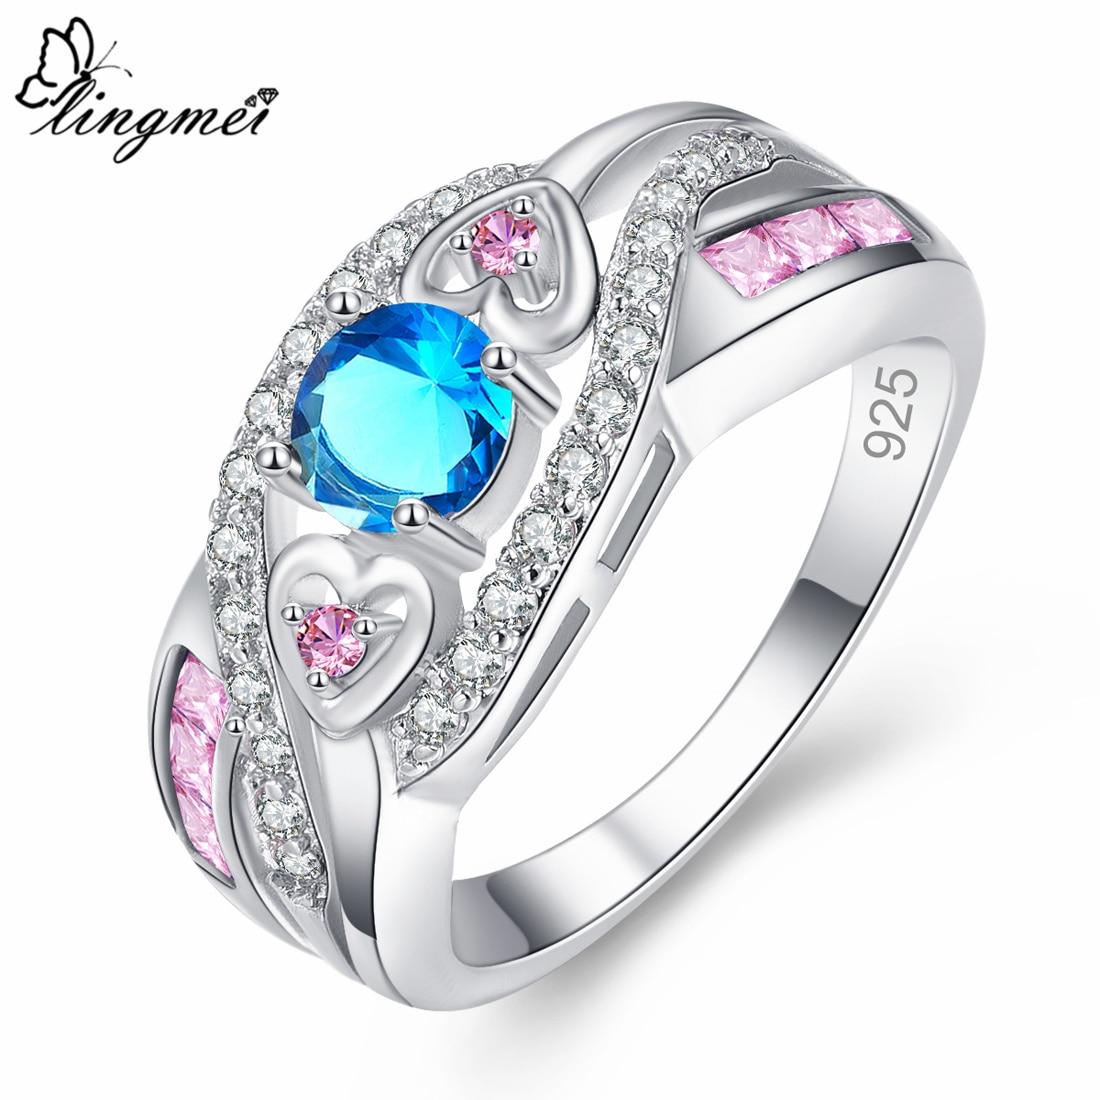 lingmei Dropshipping Fashion Women Wedding Jewelry Oval Heart Design Multi & Purple White CZ Silver Color Ring Size 6 7 8 9 2